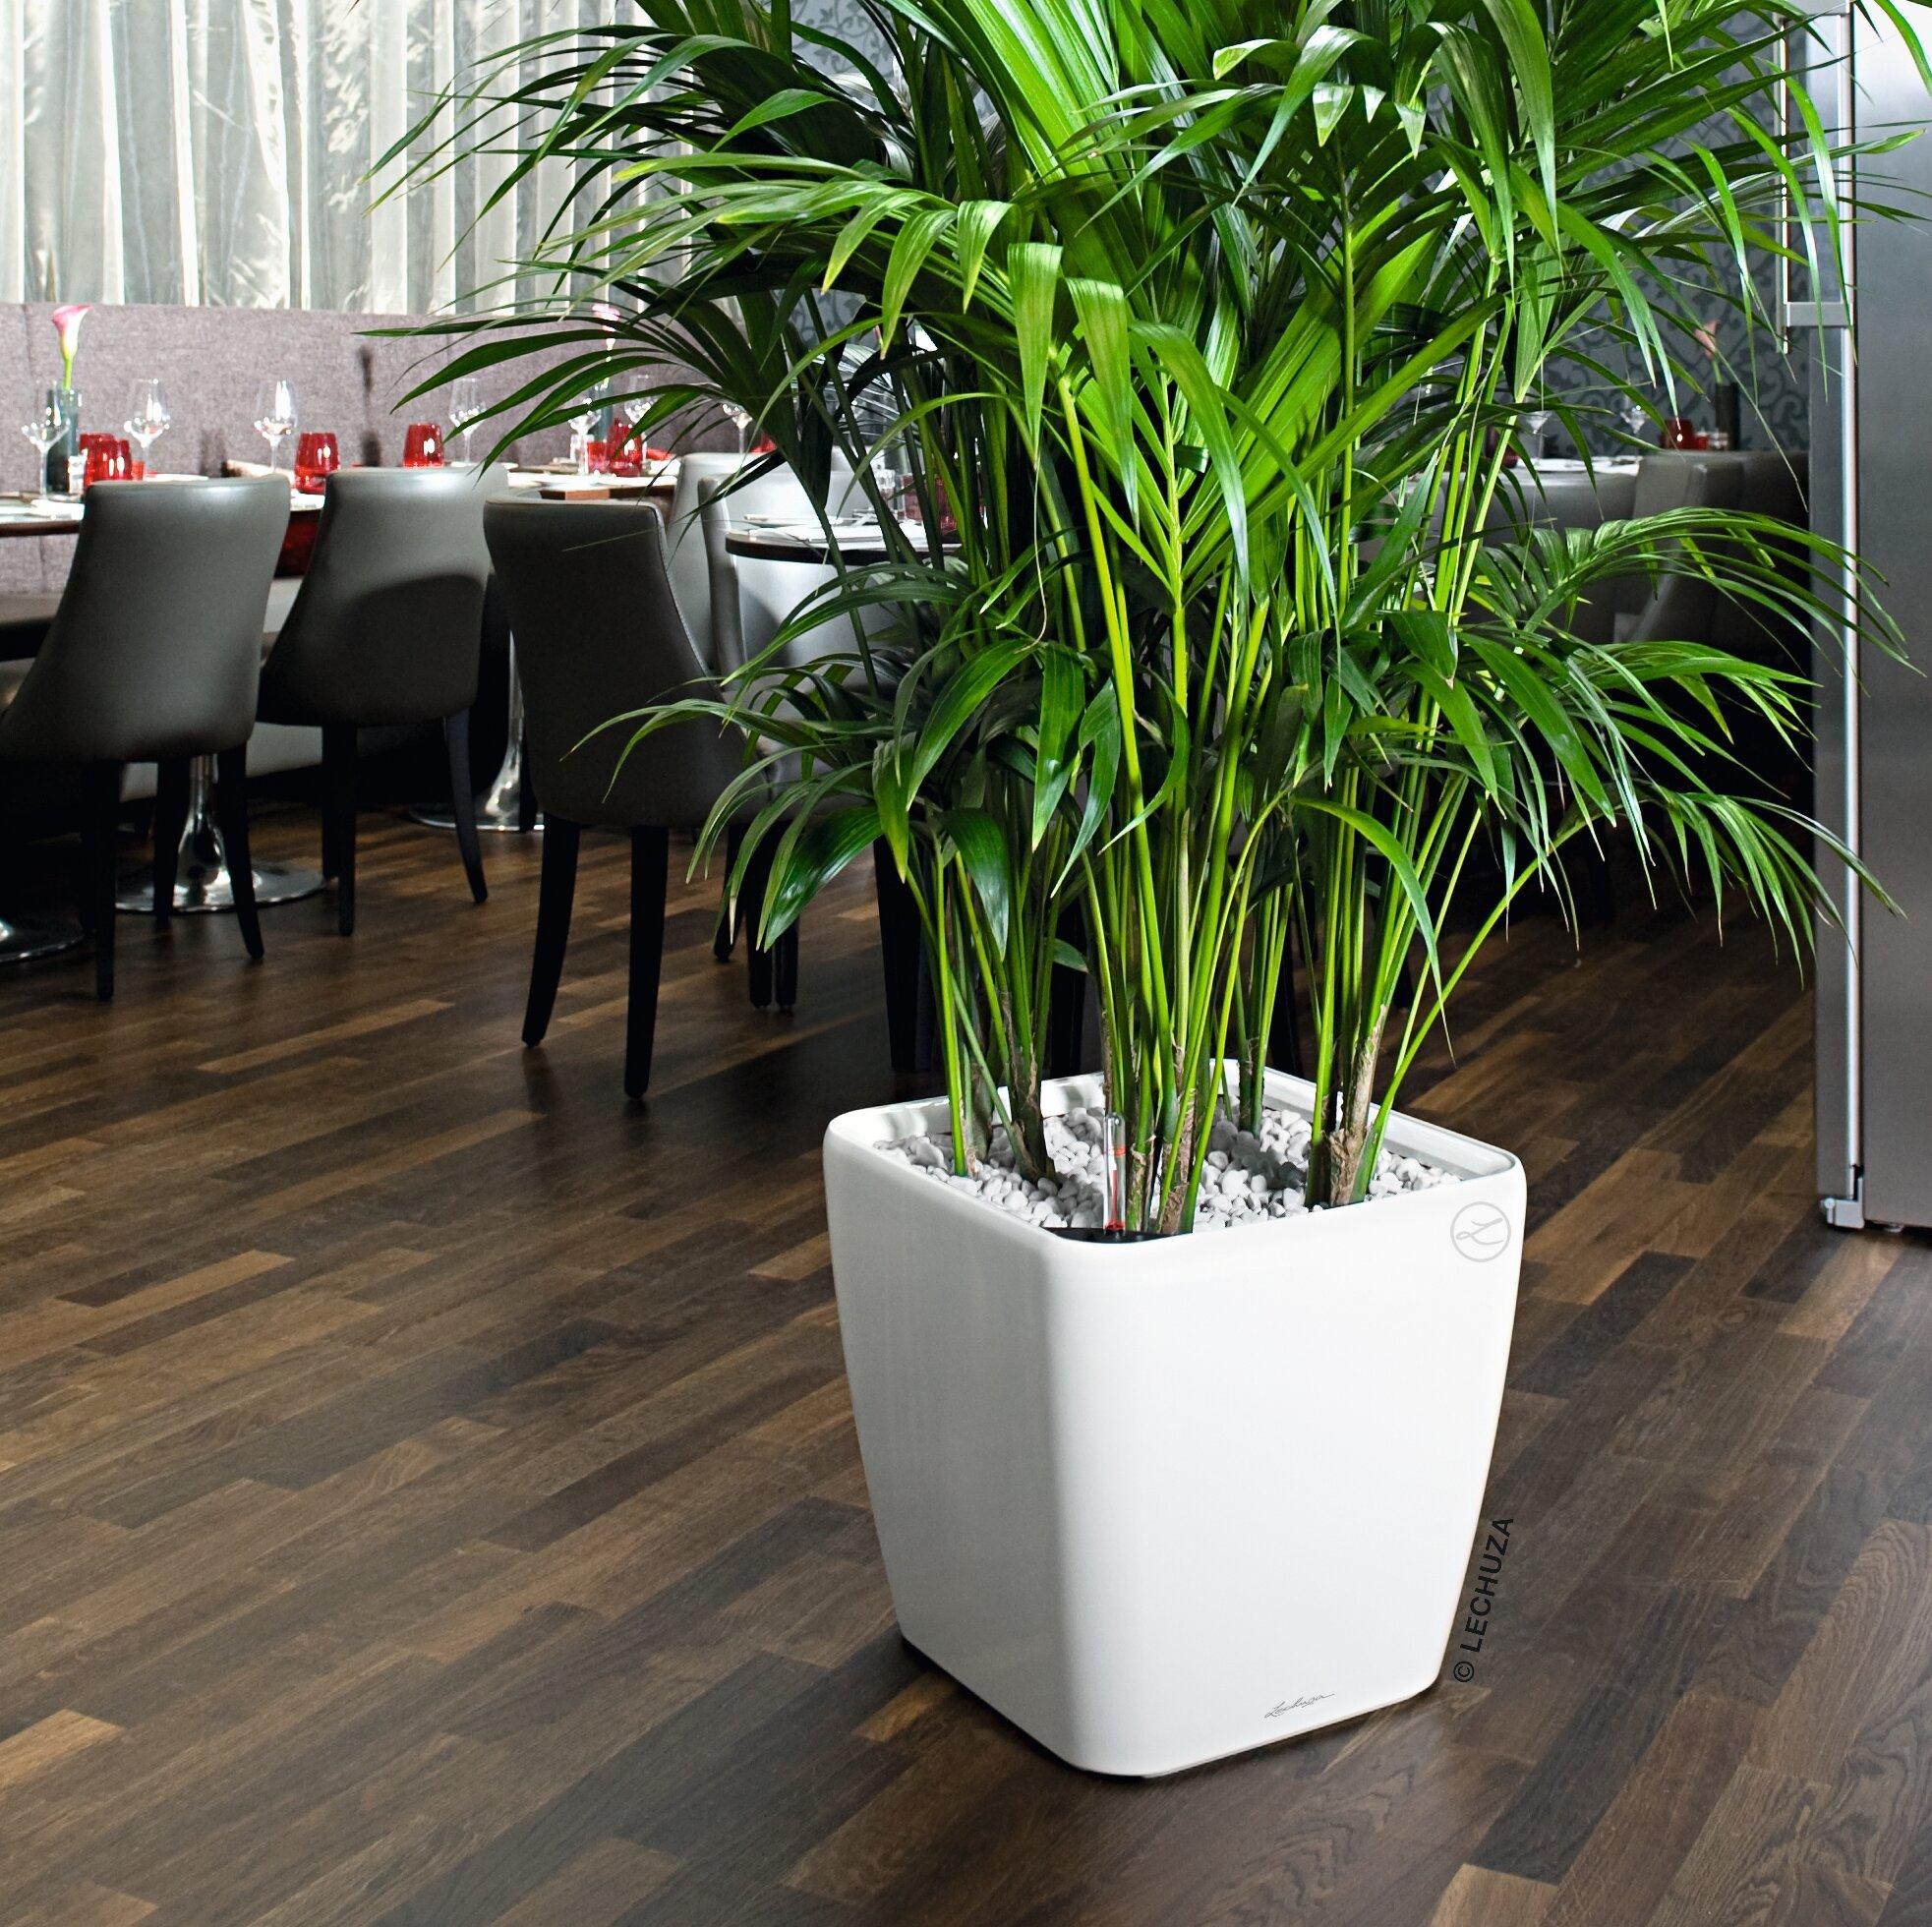 Lechuza Quadro Premium Square Self Watering Plant Pot Reviews Wayfair Co Uk